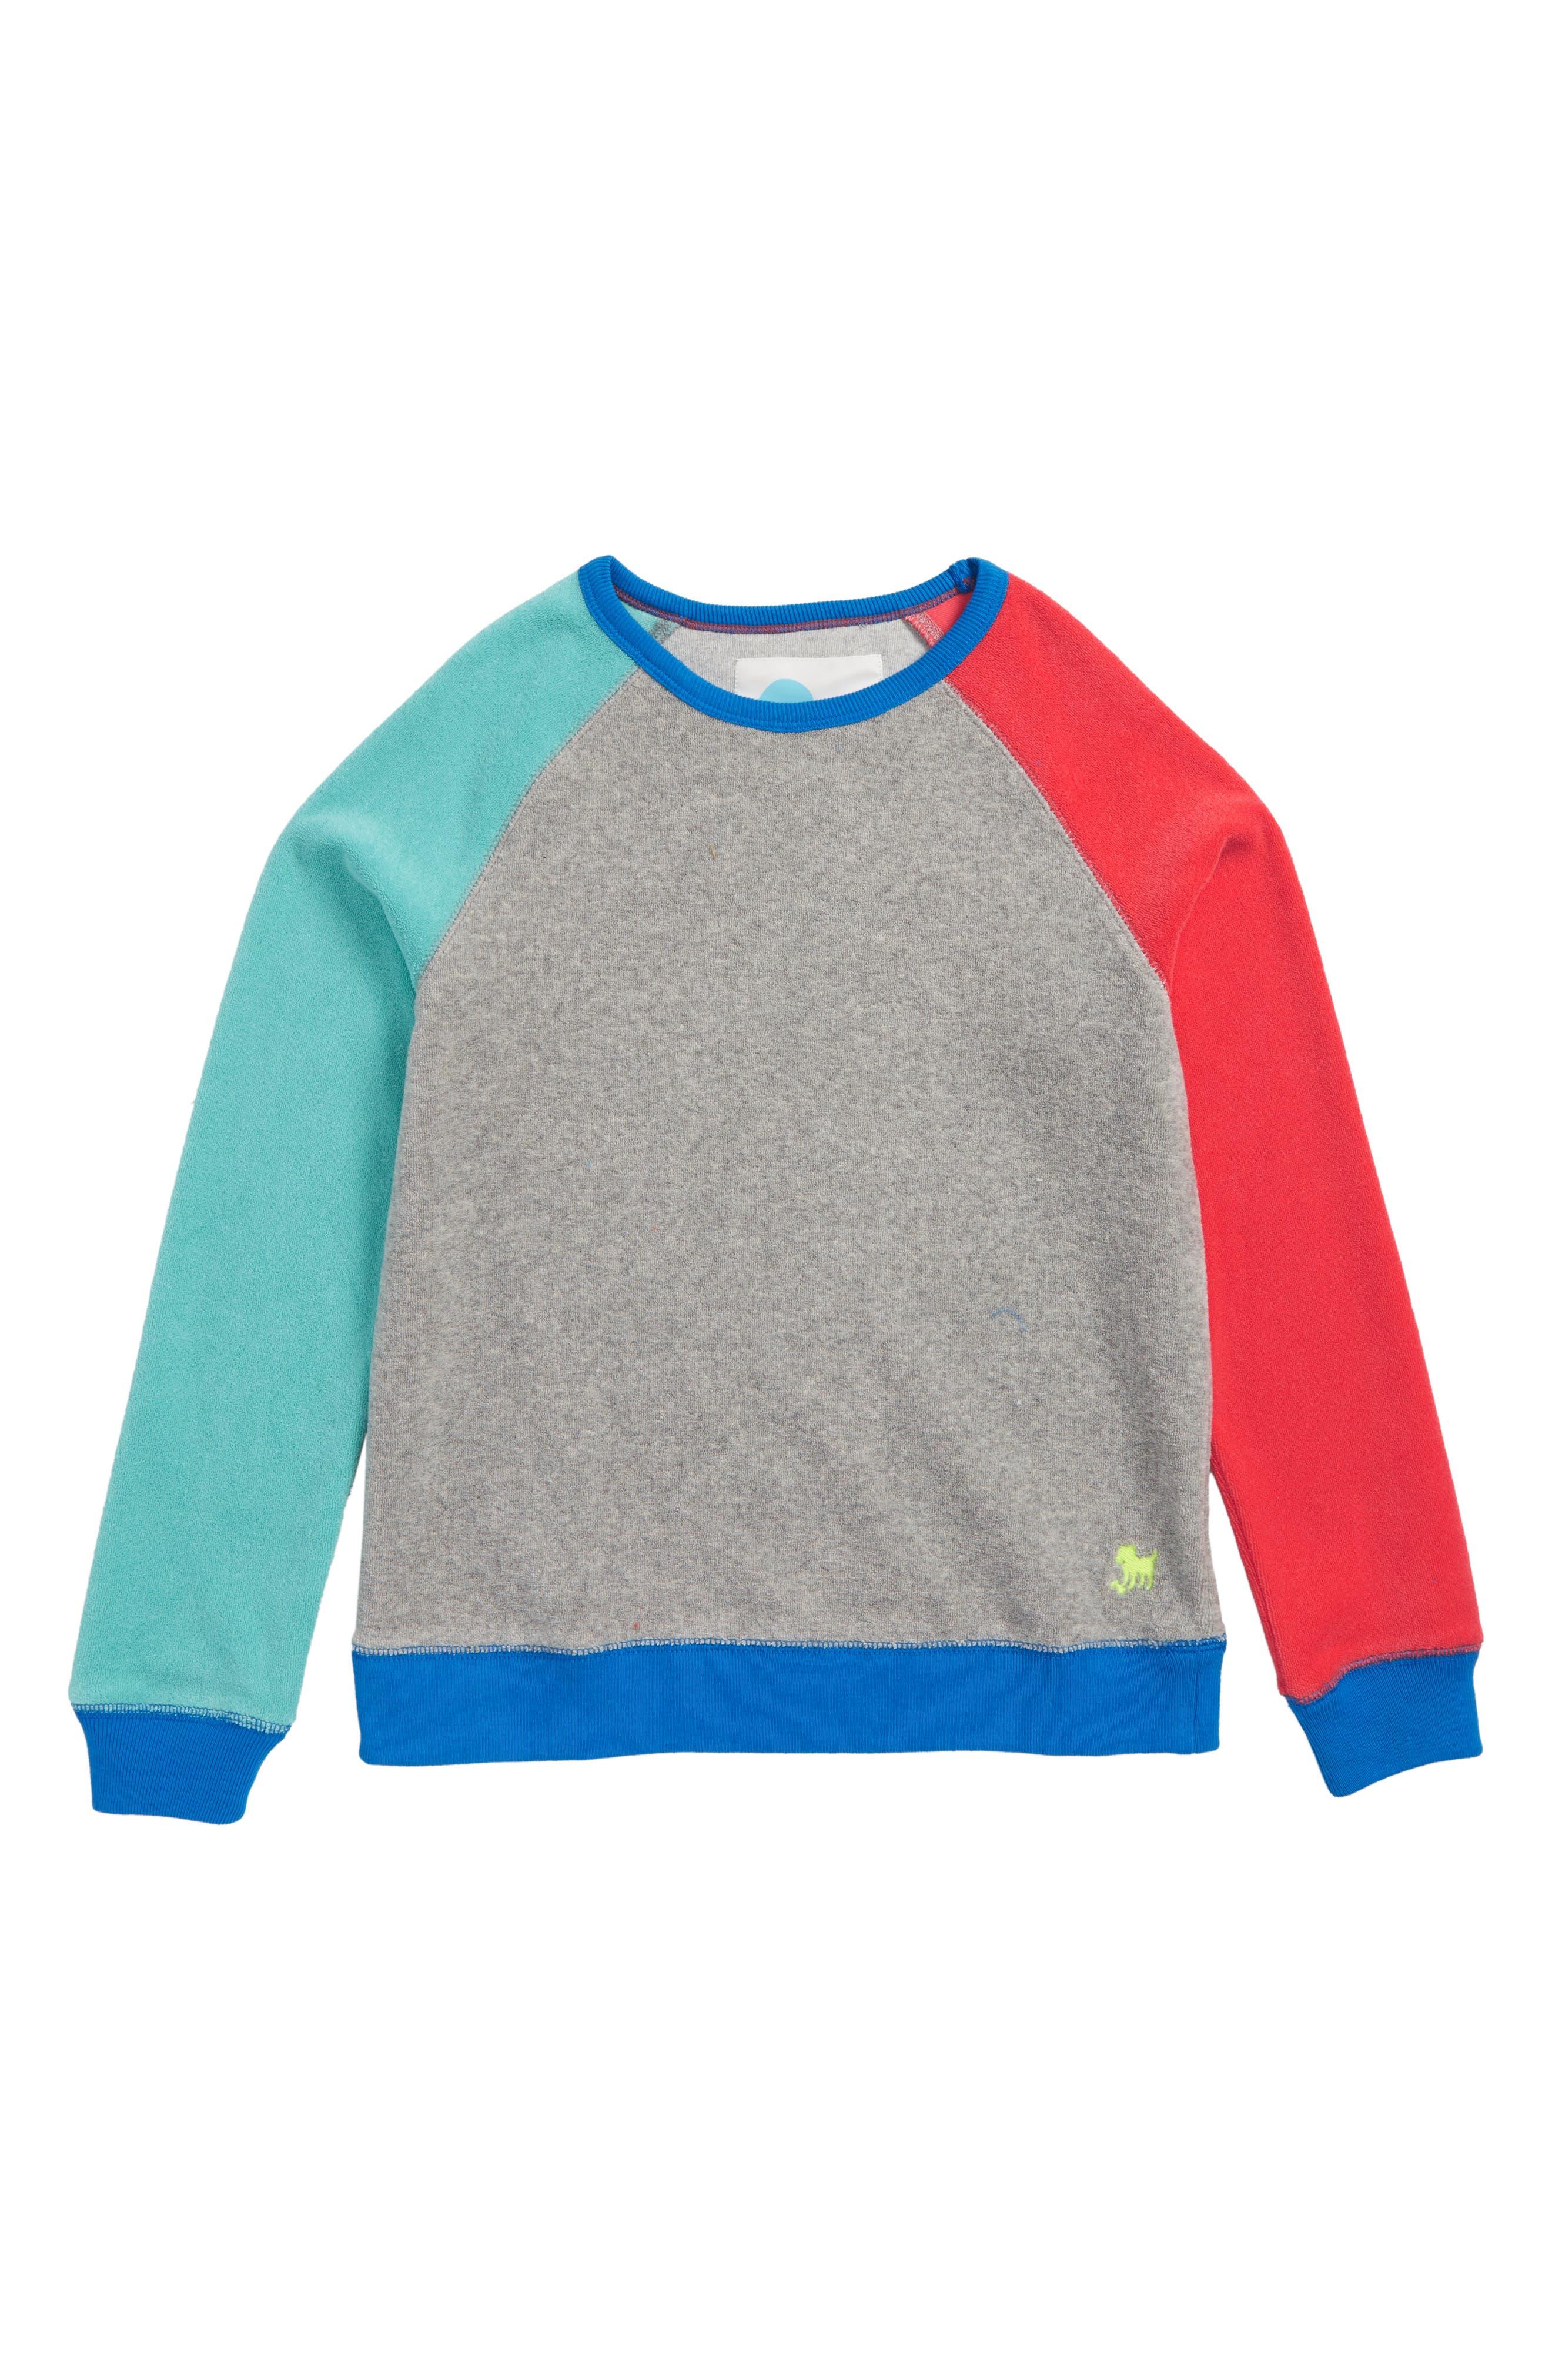 Toweling Sweatshirt,                         Main,                         color,